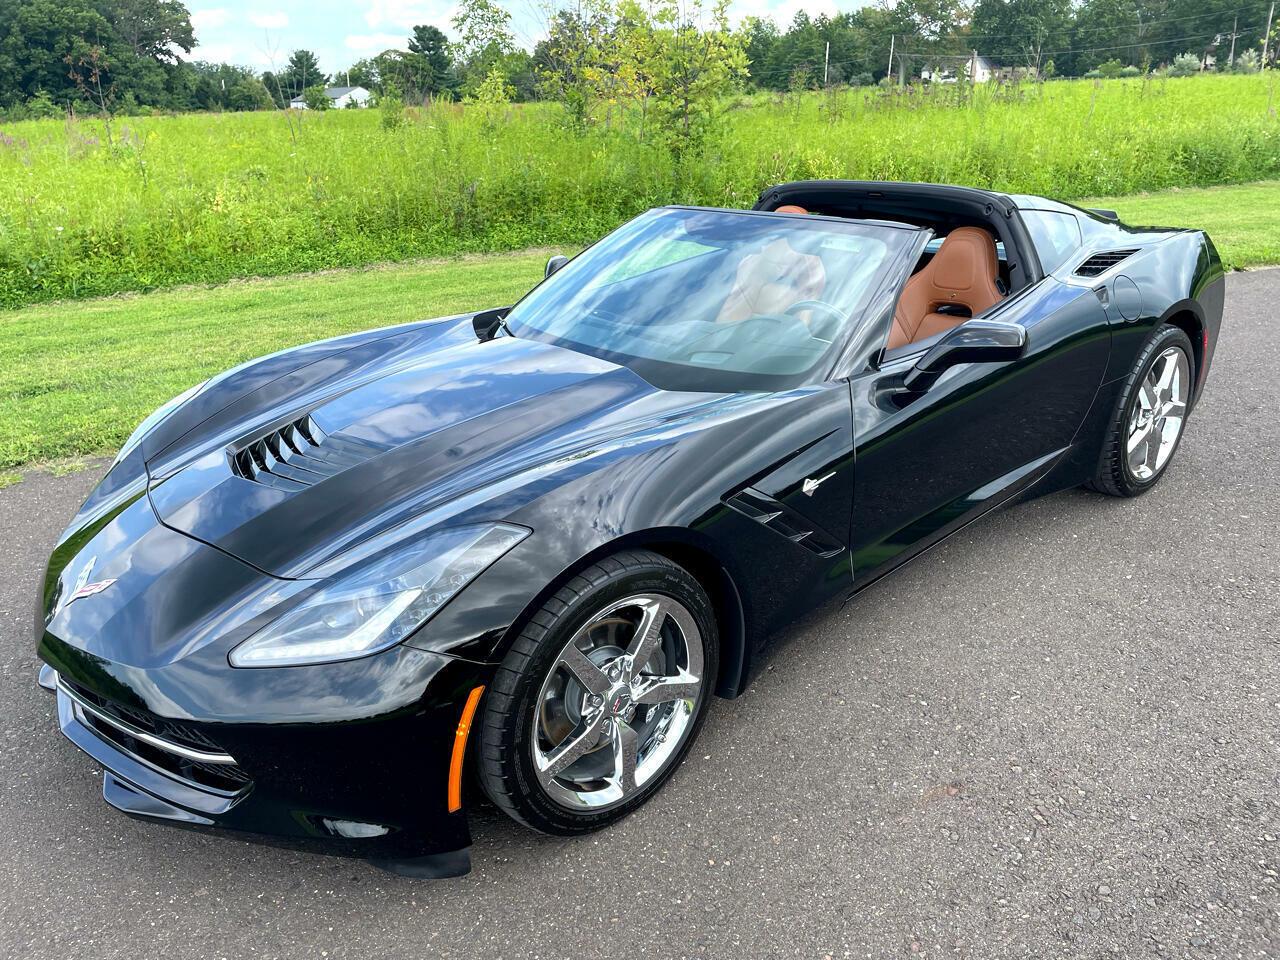 2014 Black Chevrolet Corvette Coupe 3LT | C7 Corvette Photo 2